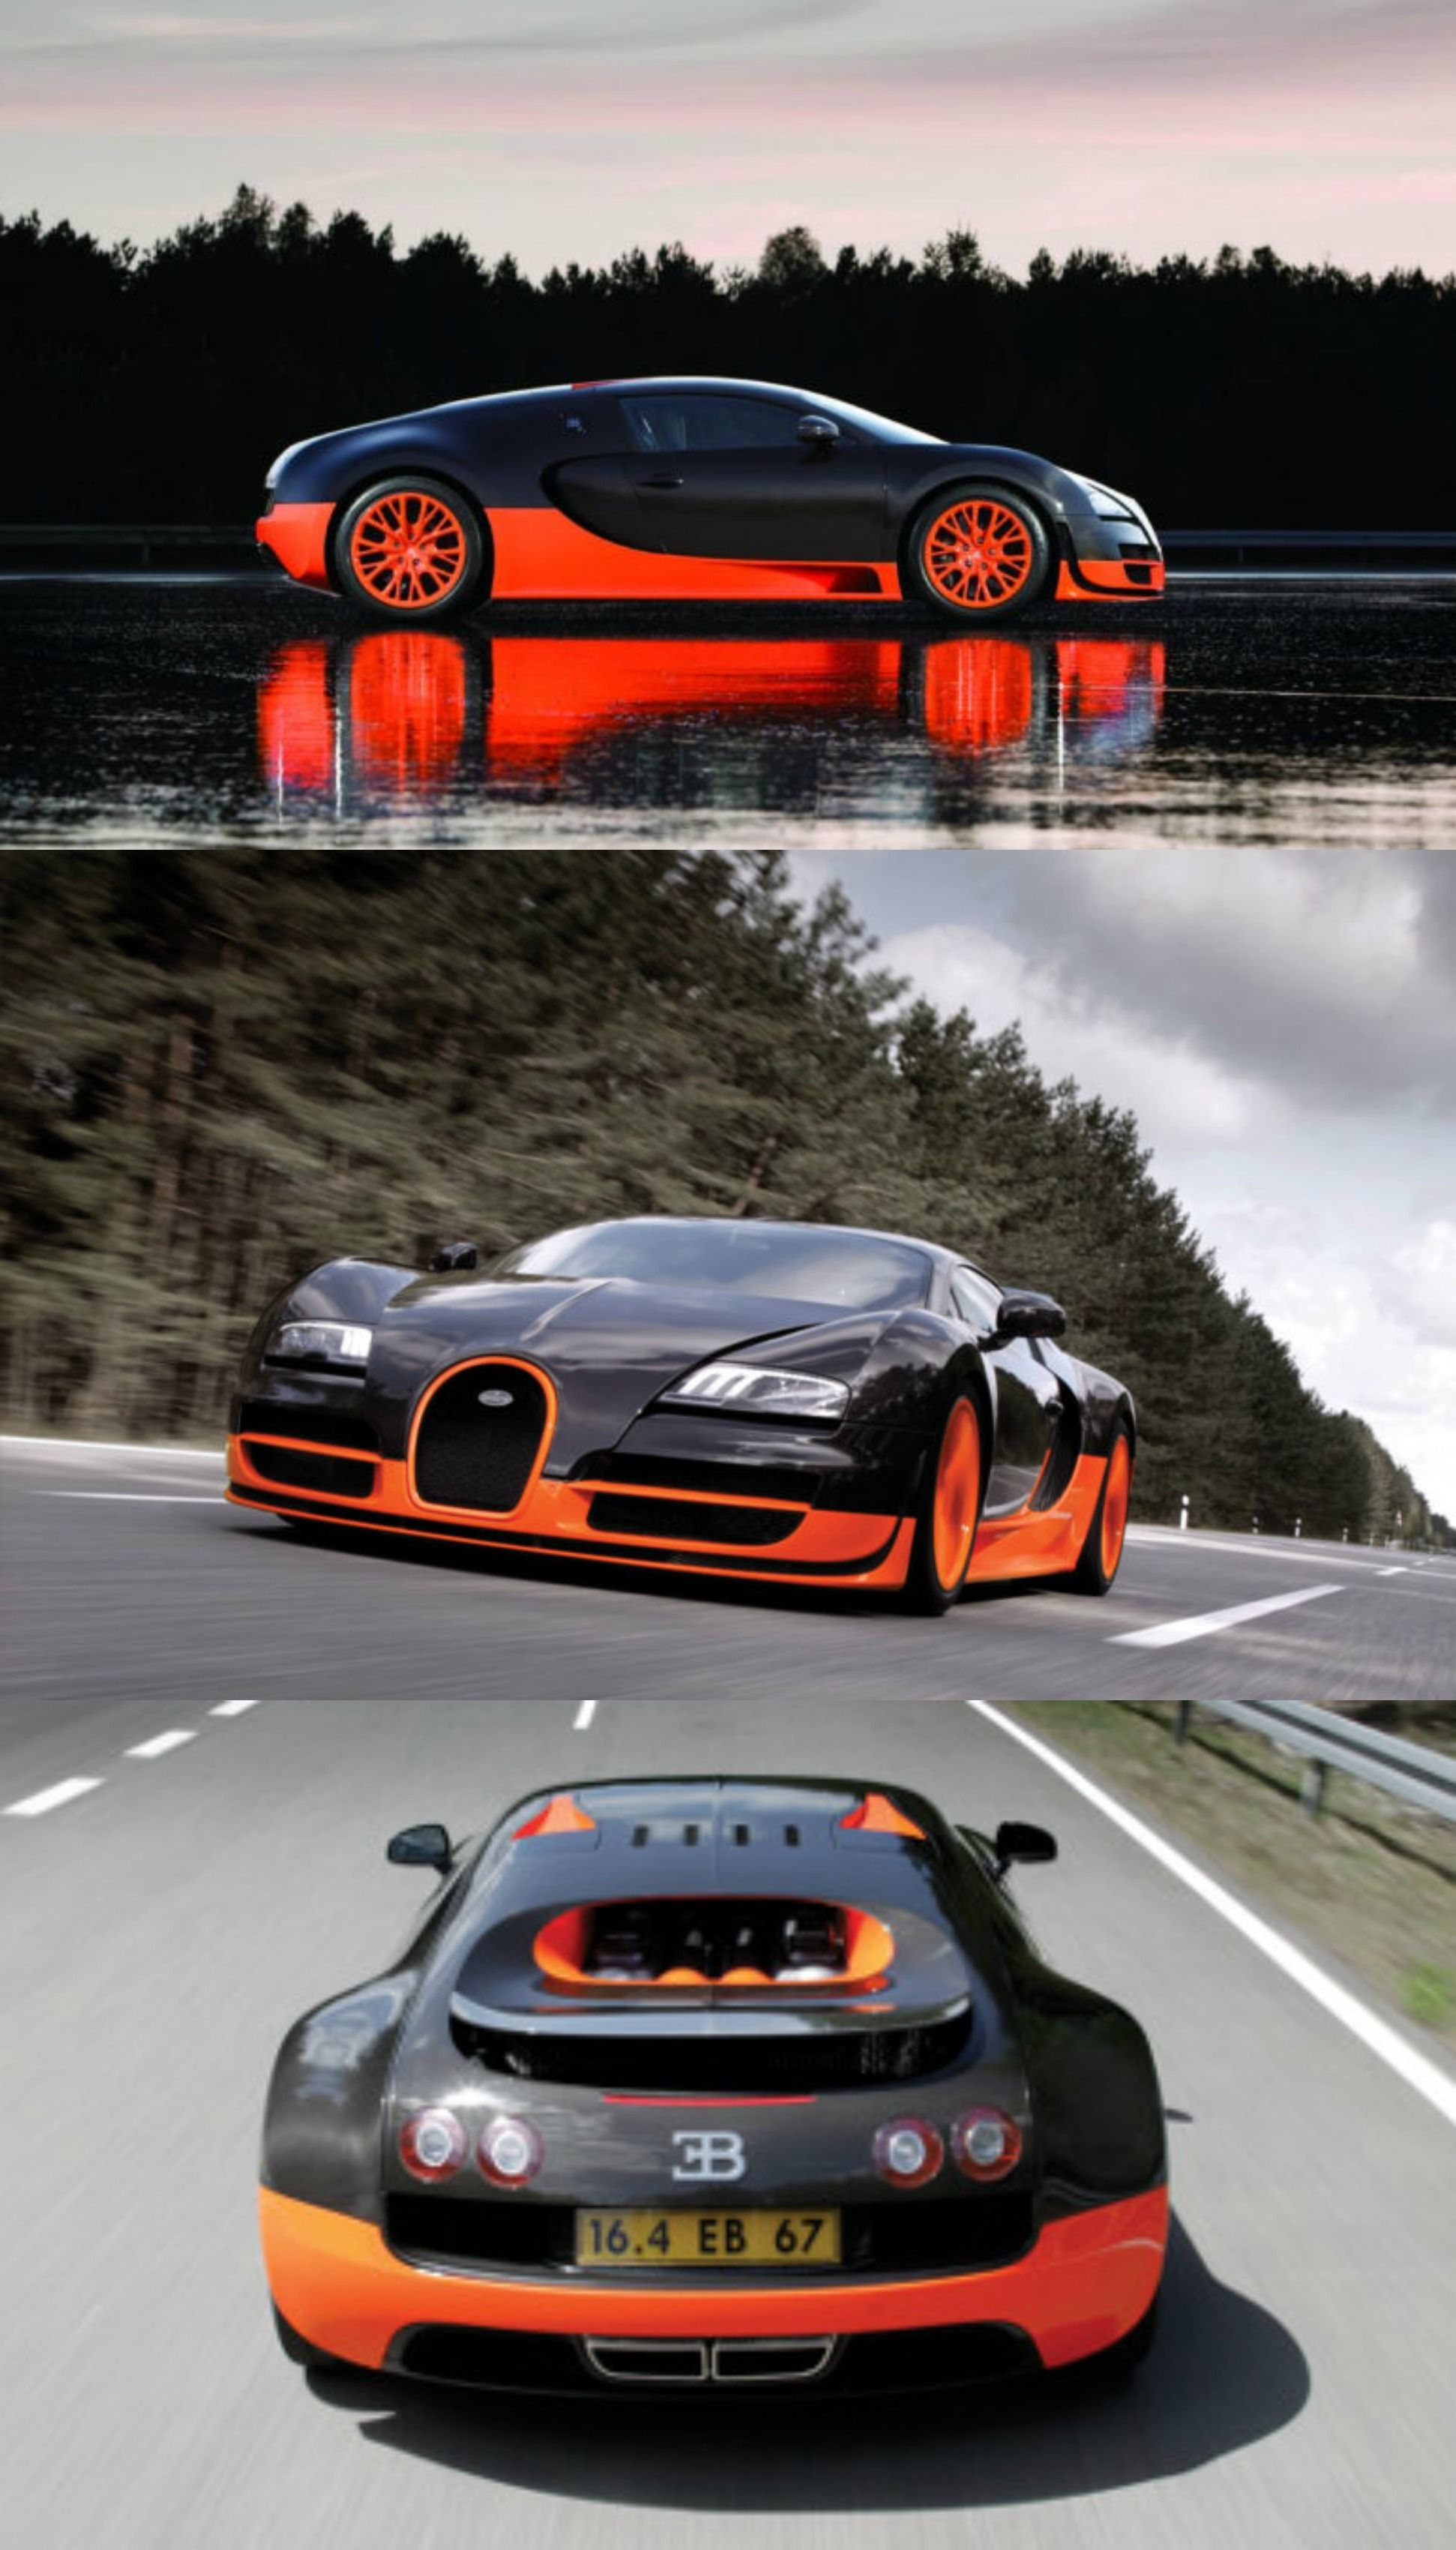 f58cf23c7576c878a1d17536c73b0dab Interesting Bugatti Veyron Grand Sport Vitesse Vs Pagani Huayra Cars Trend